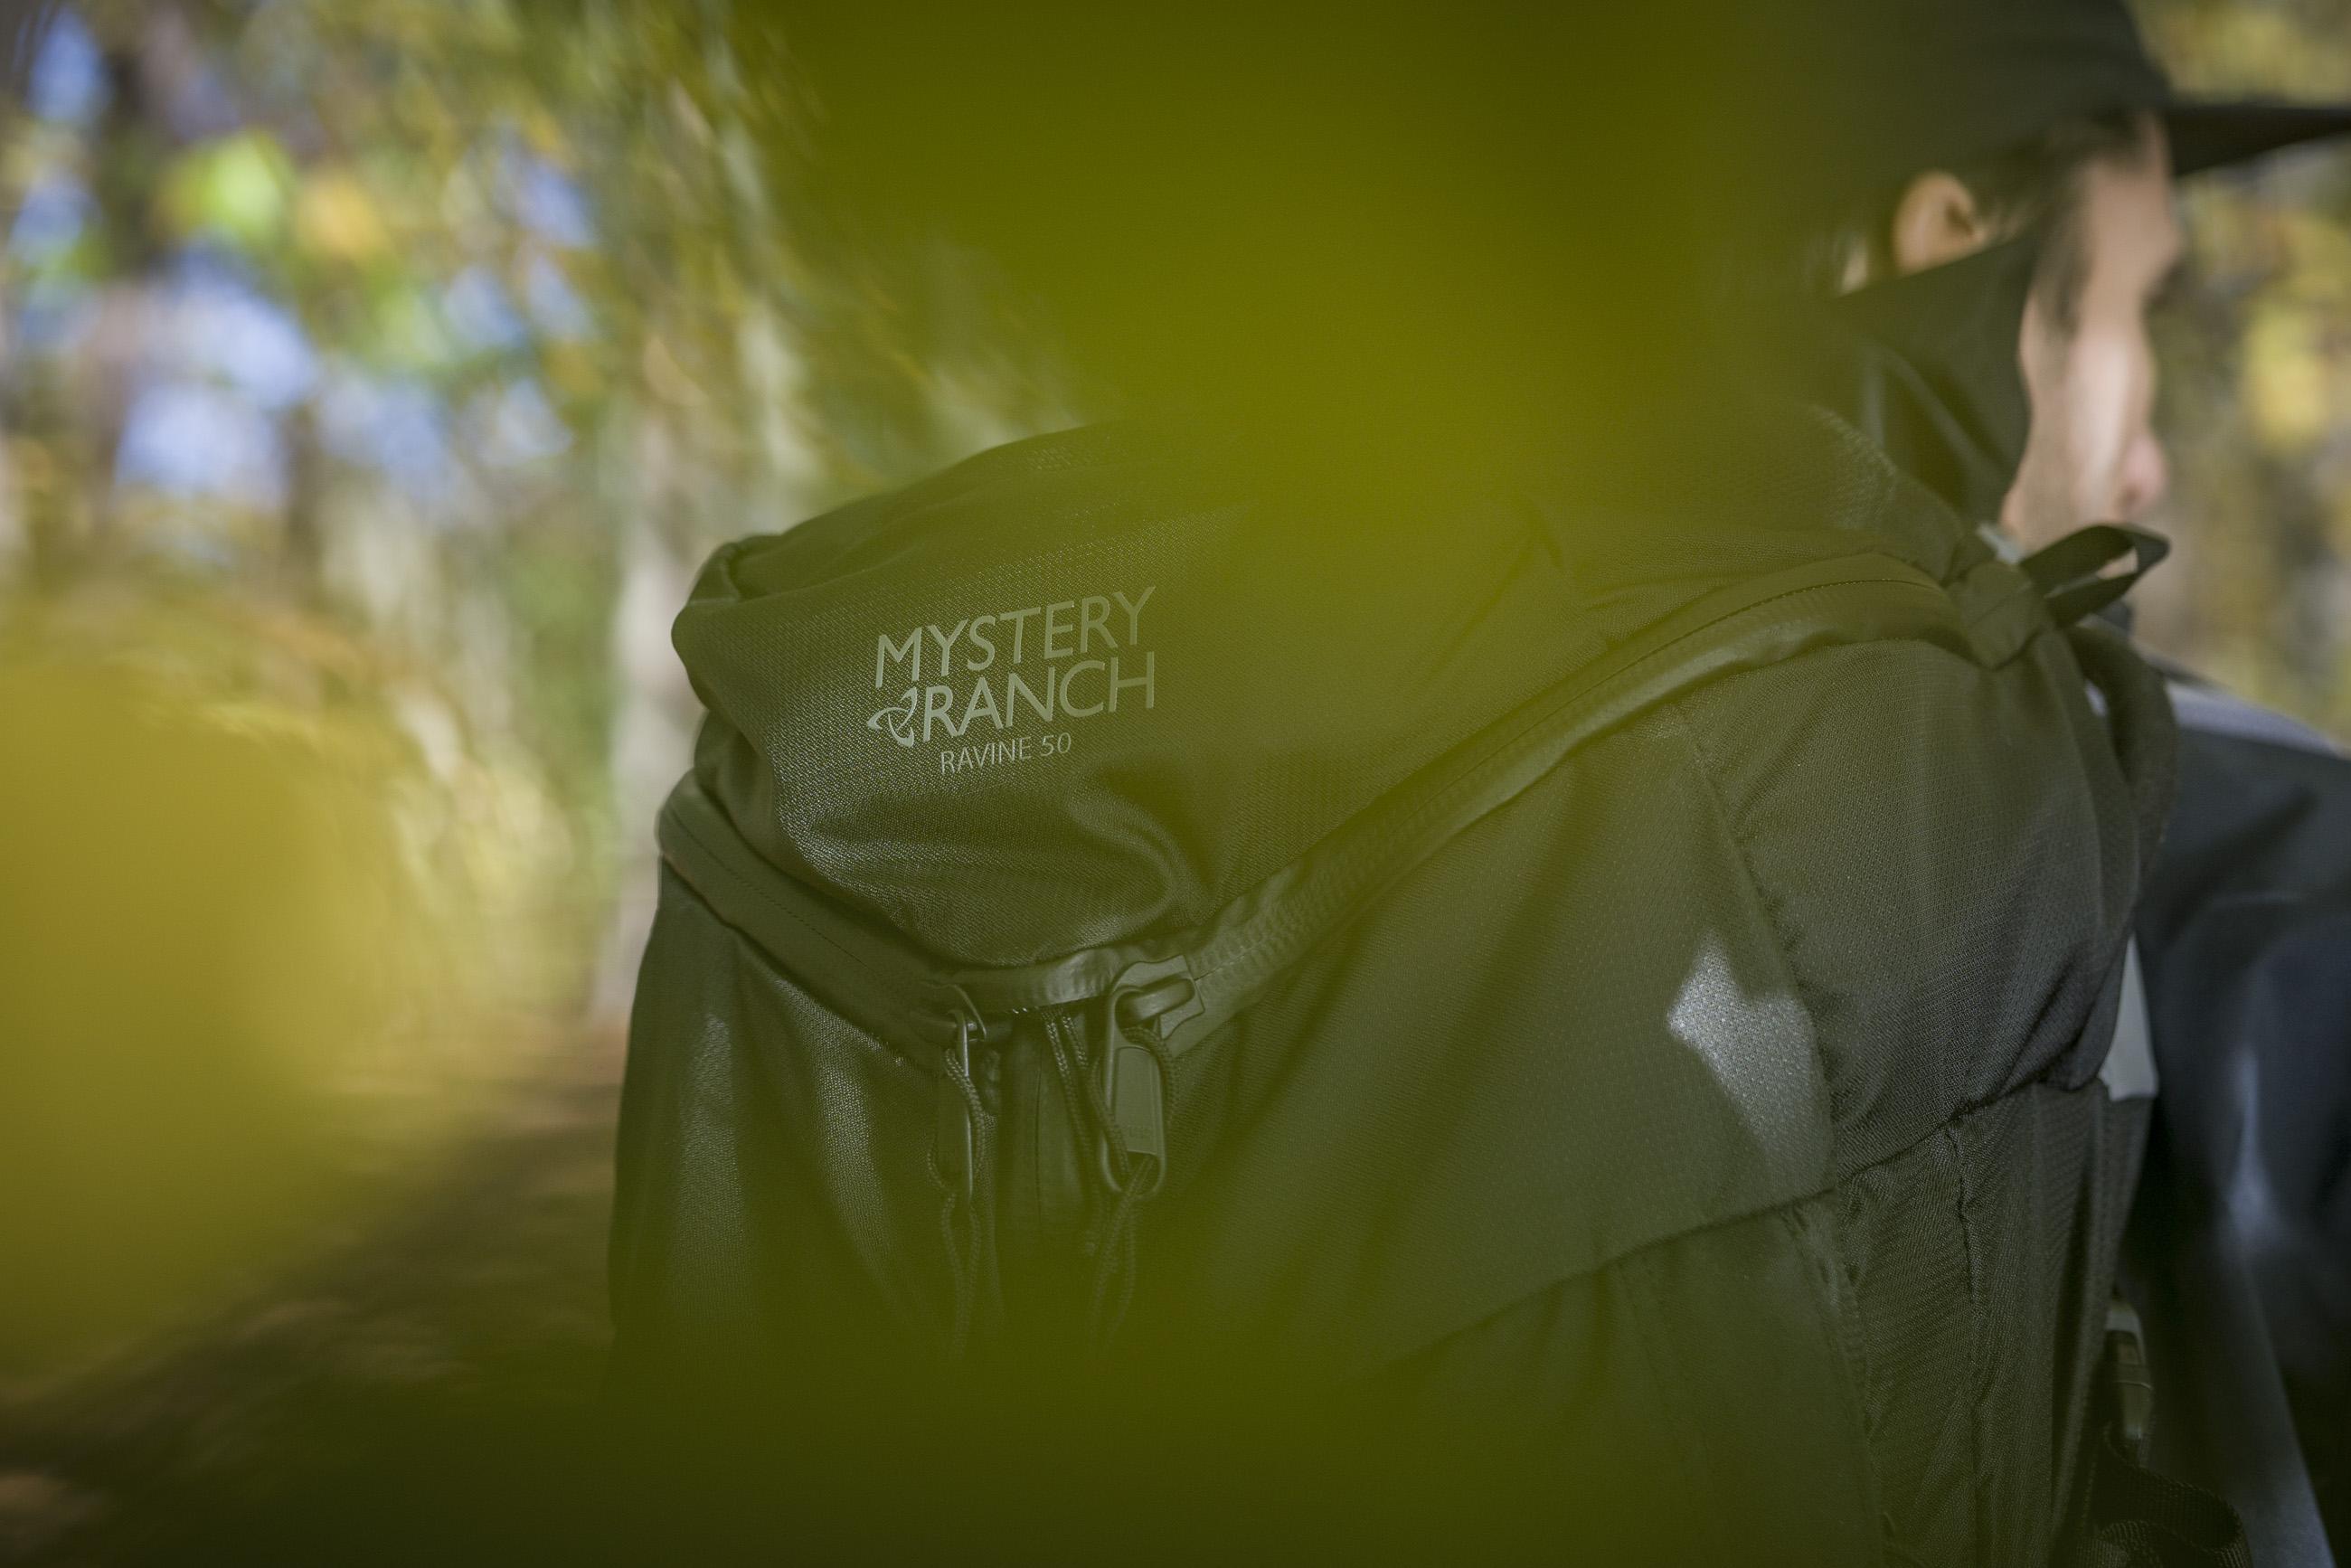 mystery-ranch-ravine-50-black-045